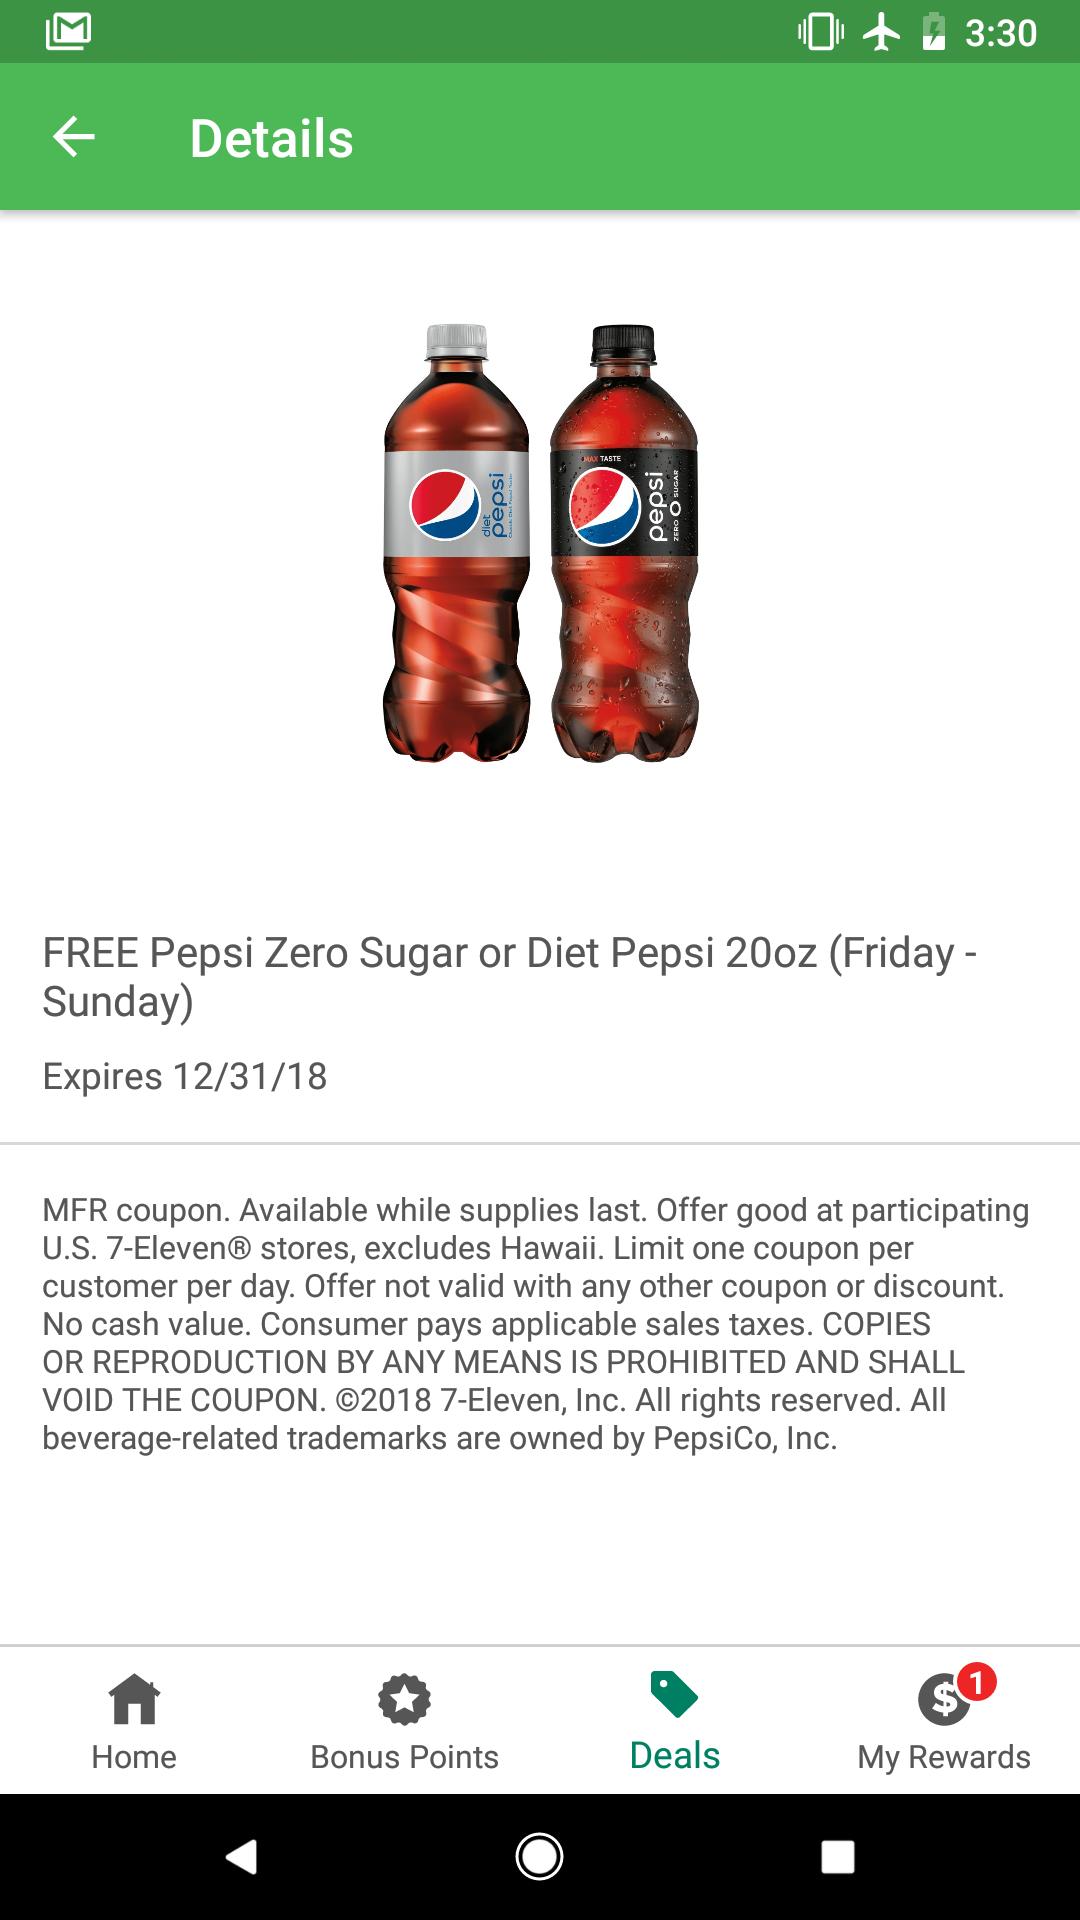 Free 20oz Diet Pepsi or Pepsi Zero Sugar at 7-11 7-Eleven Friday ...